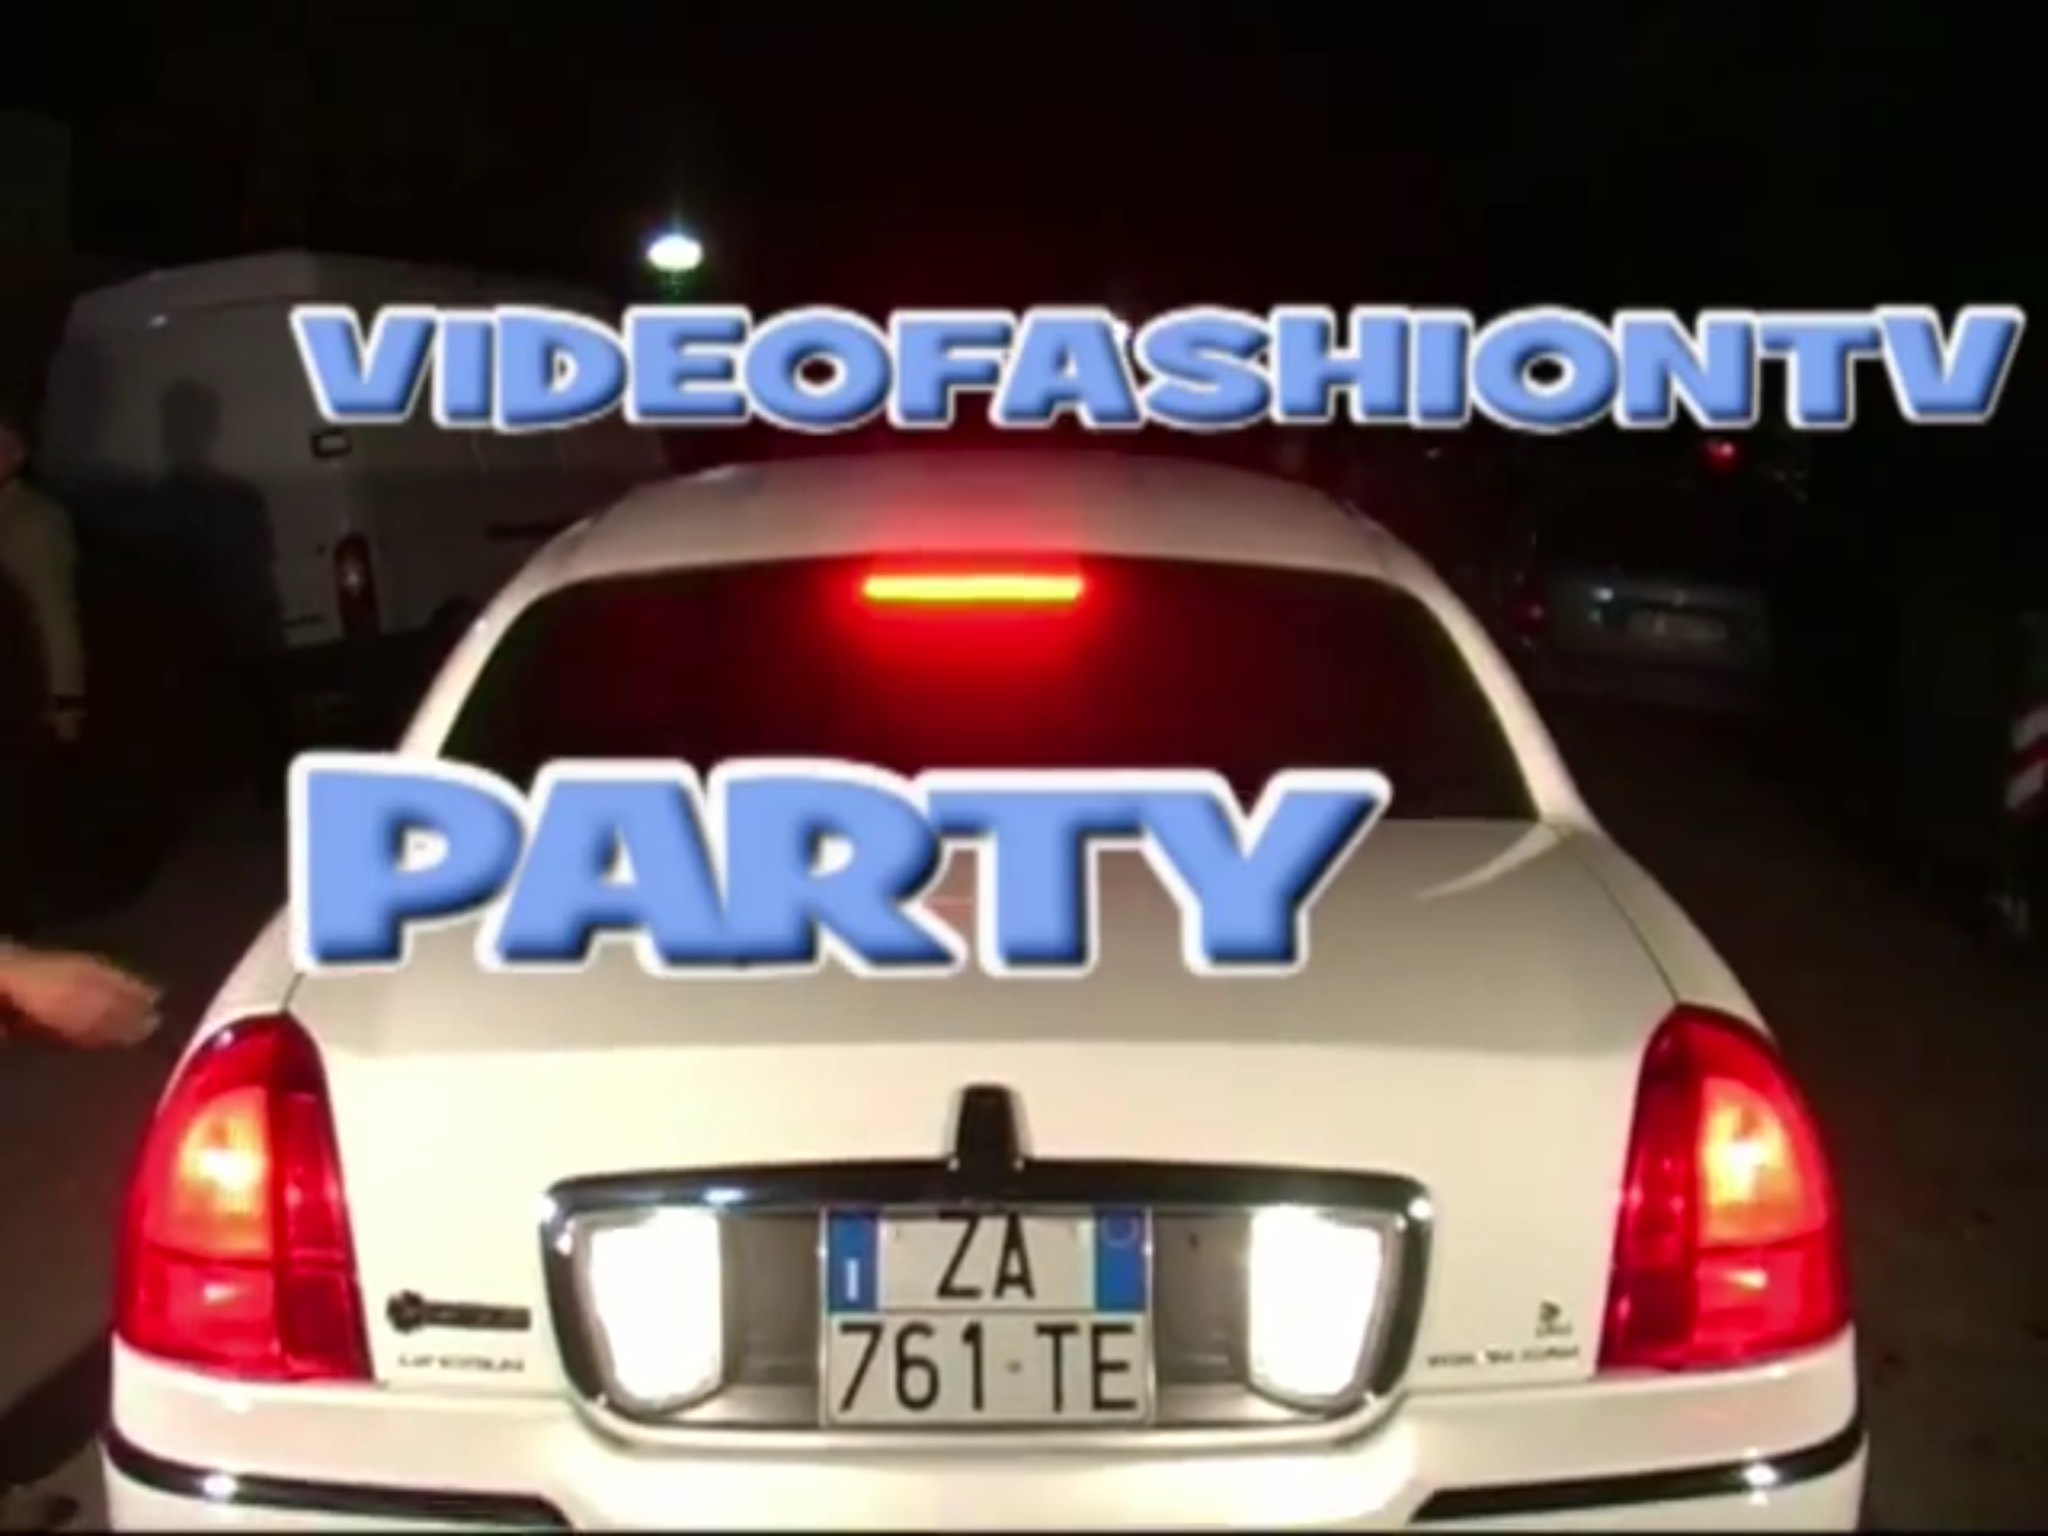 Videofashiontv party 2